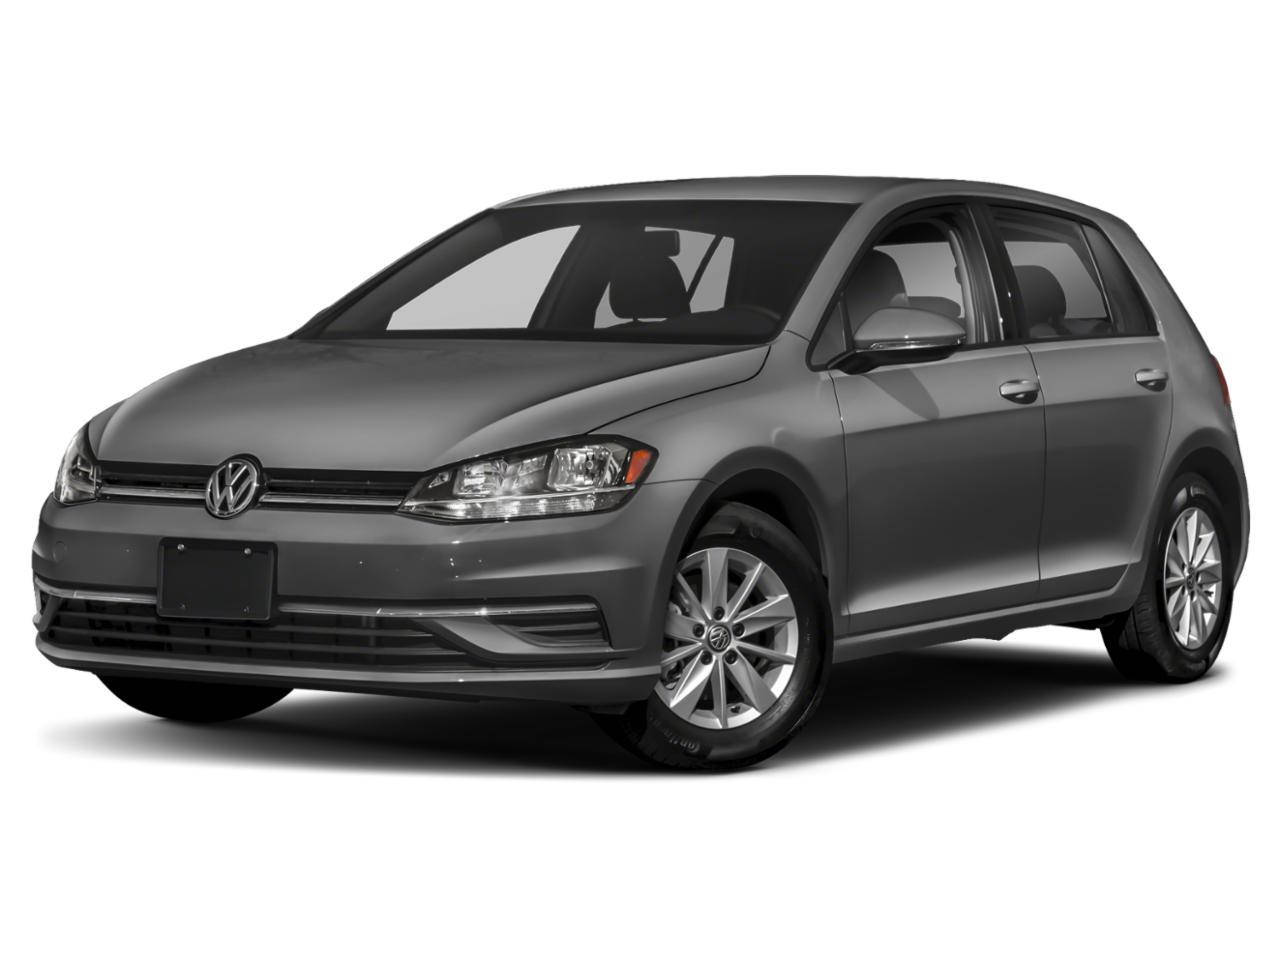 2018 Volkswagen Golf Vehicle Photo in Rockville, MD 20852